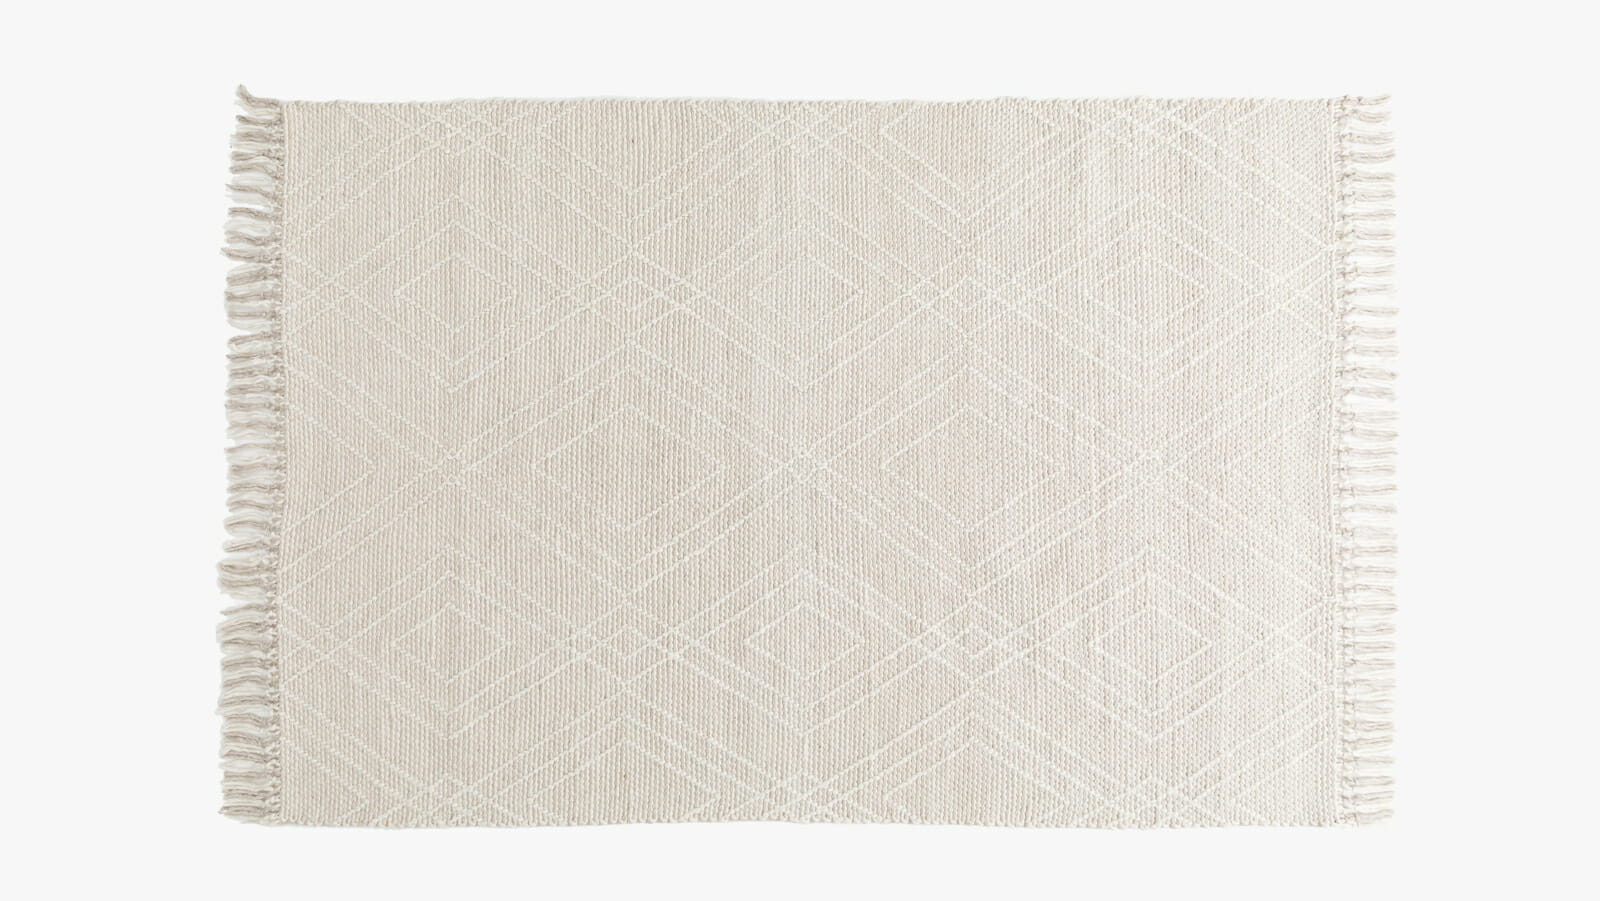 The Noa Peru rug